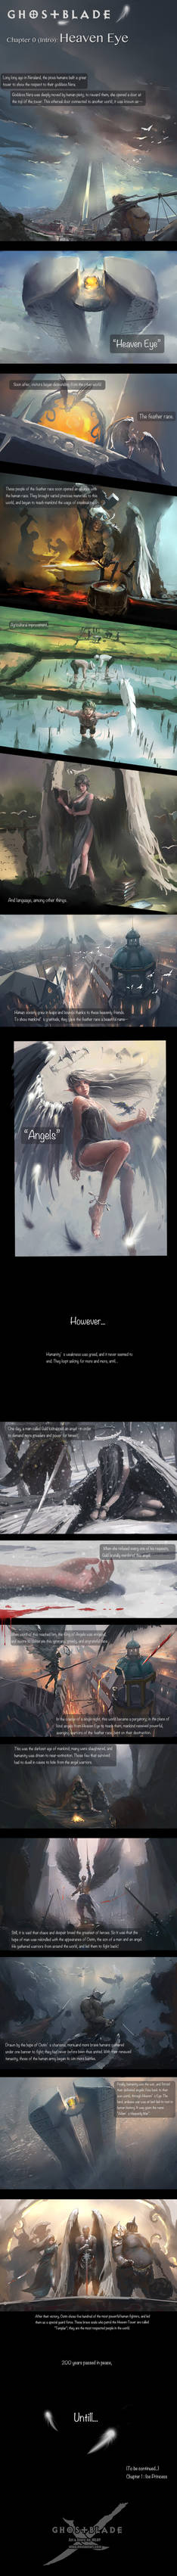 GhostBlade - Chapter 0 (Intro) : Heaven Eye